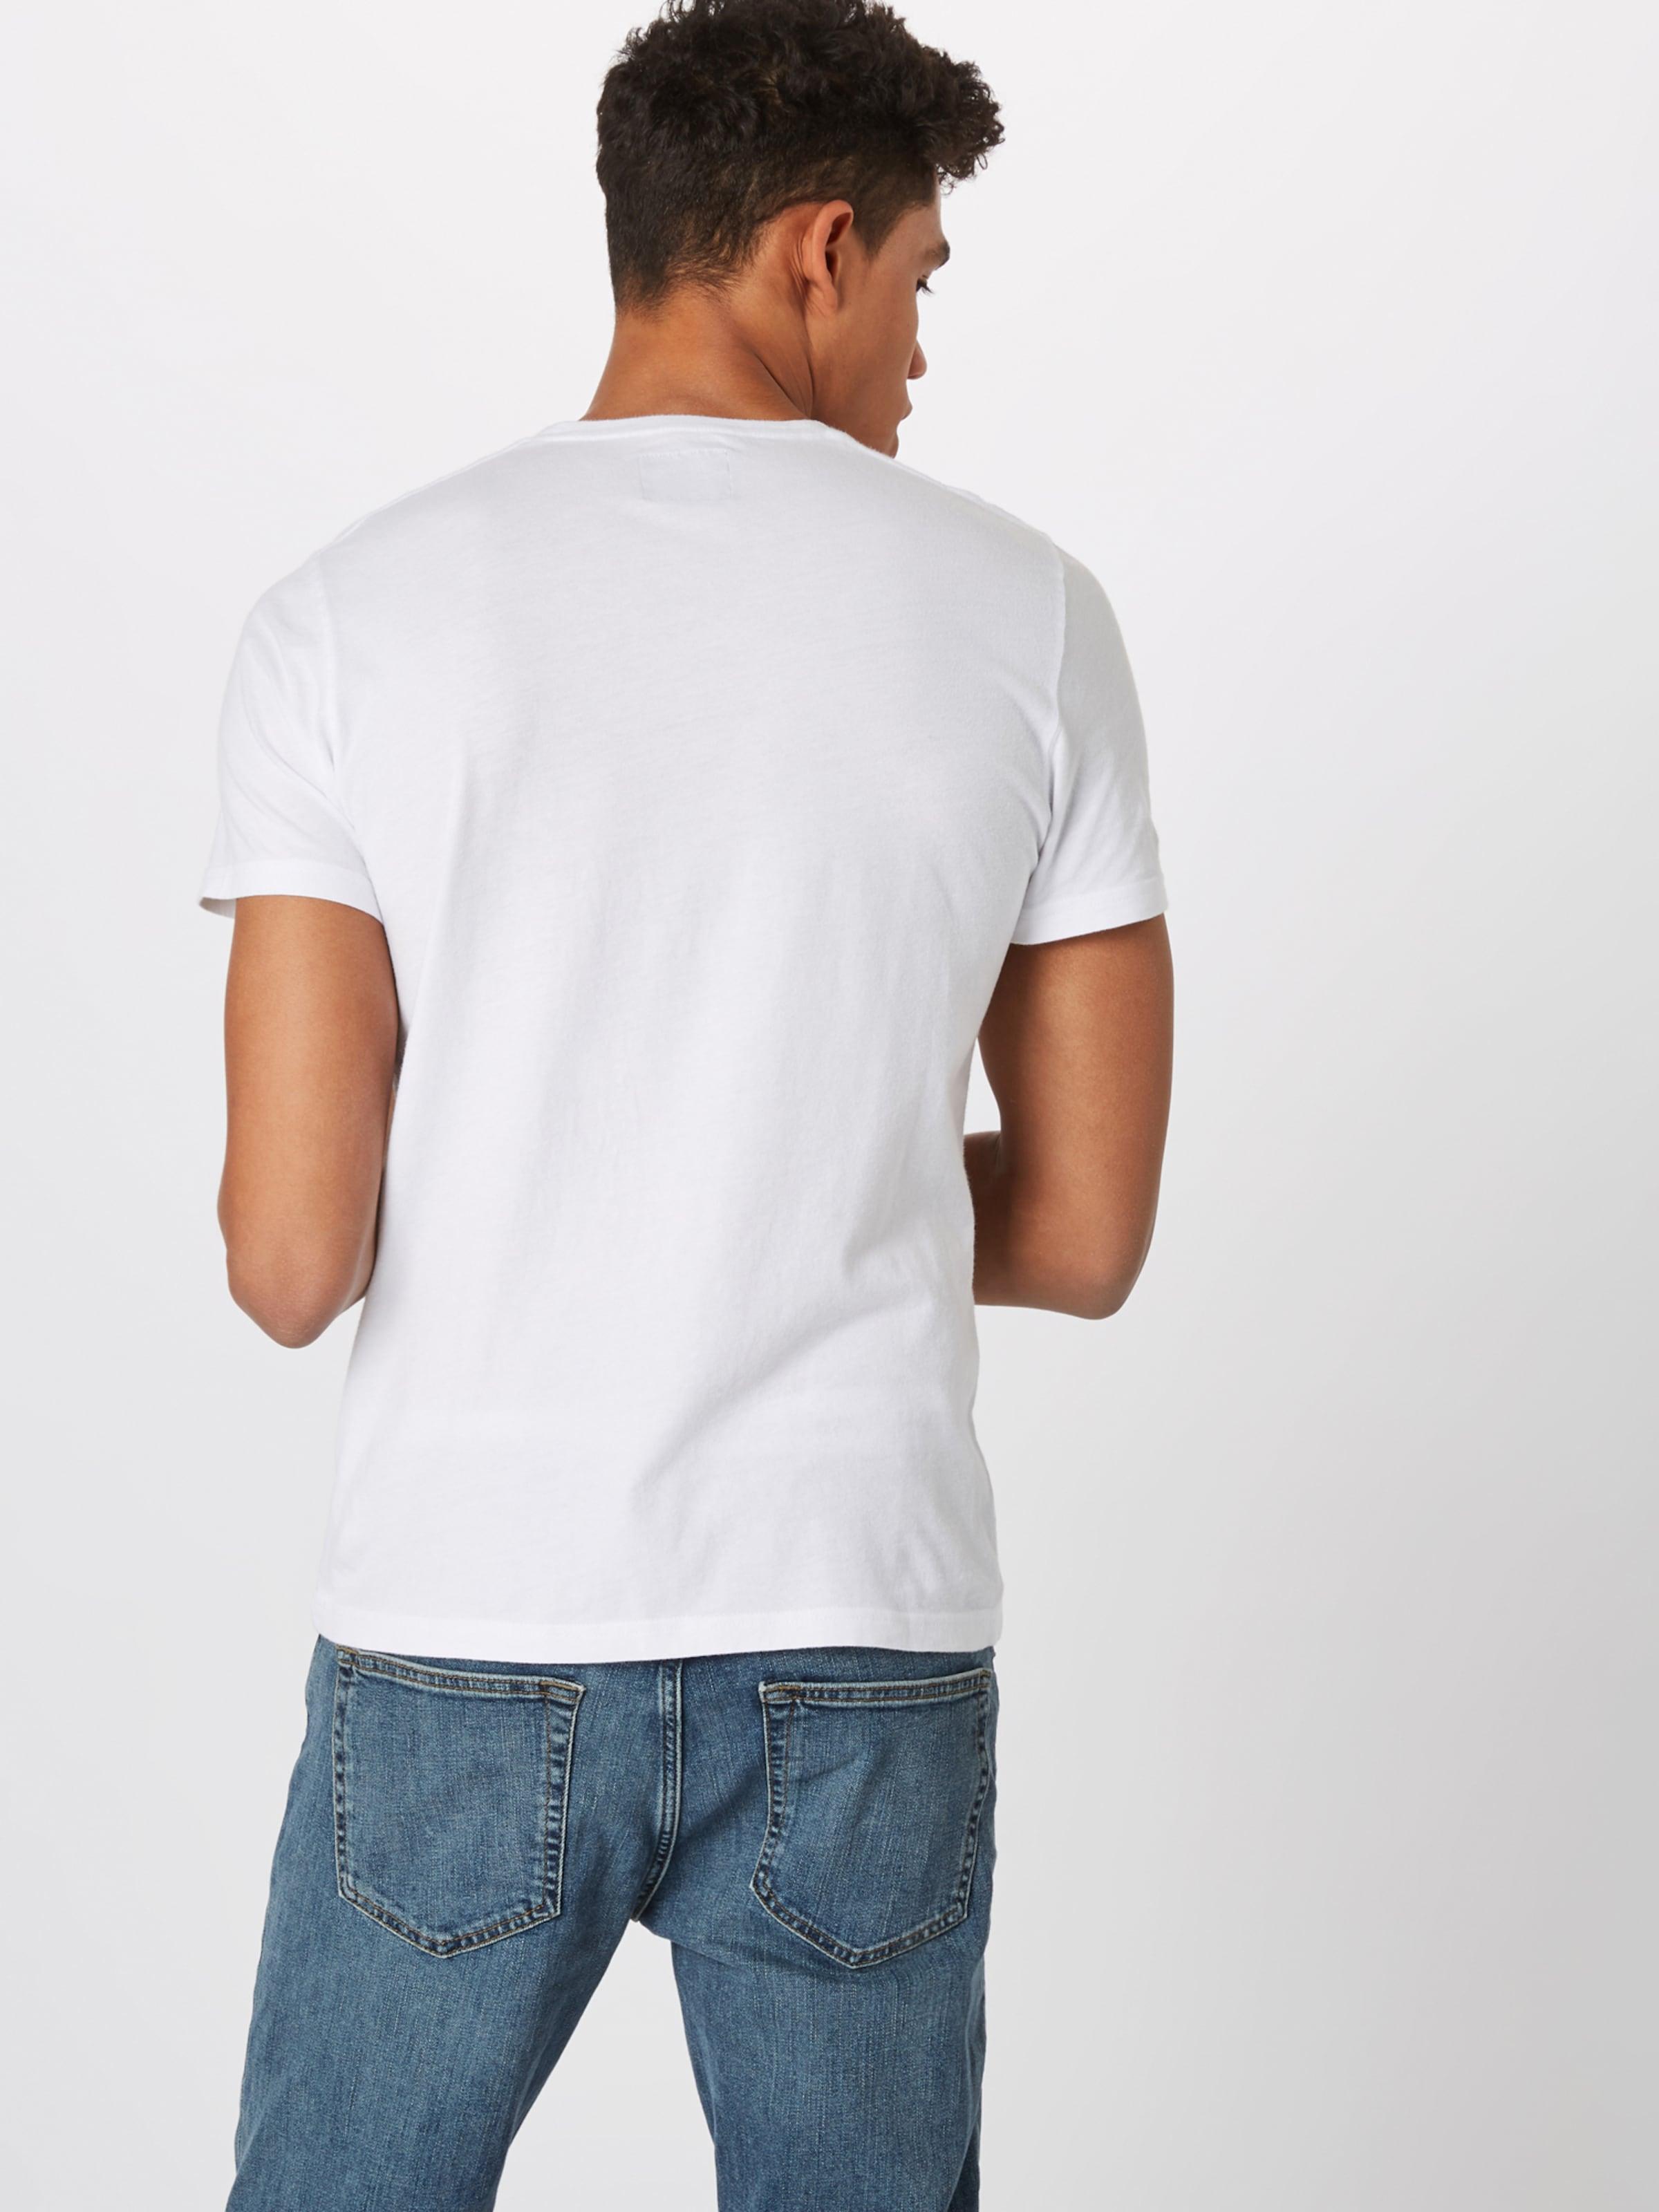 Crew Abercrombieamp; En 'glbl shirt Blanc Multipack' T Fitch sxthCrQd